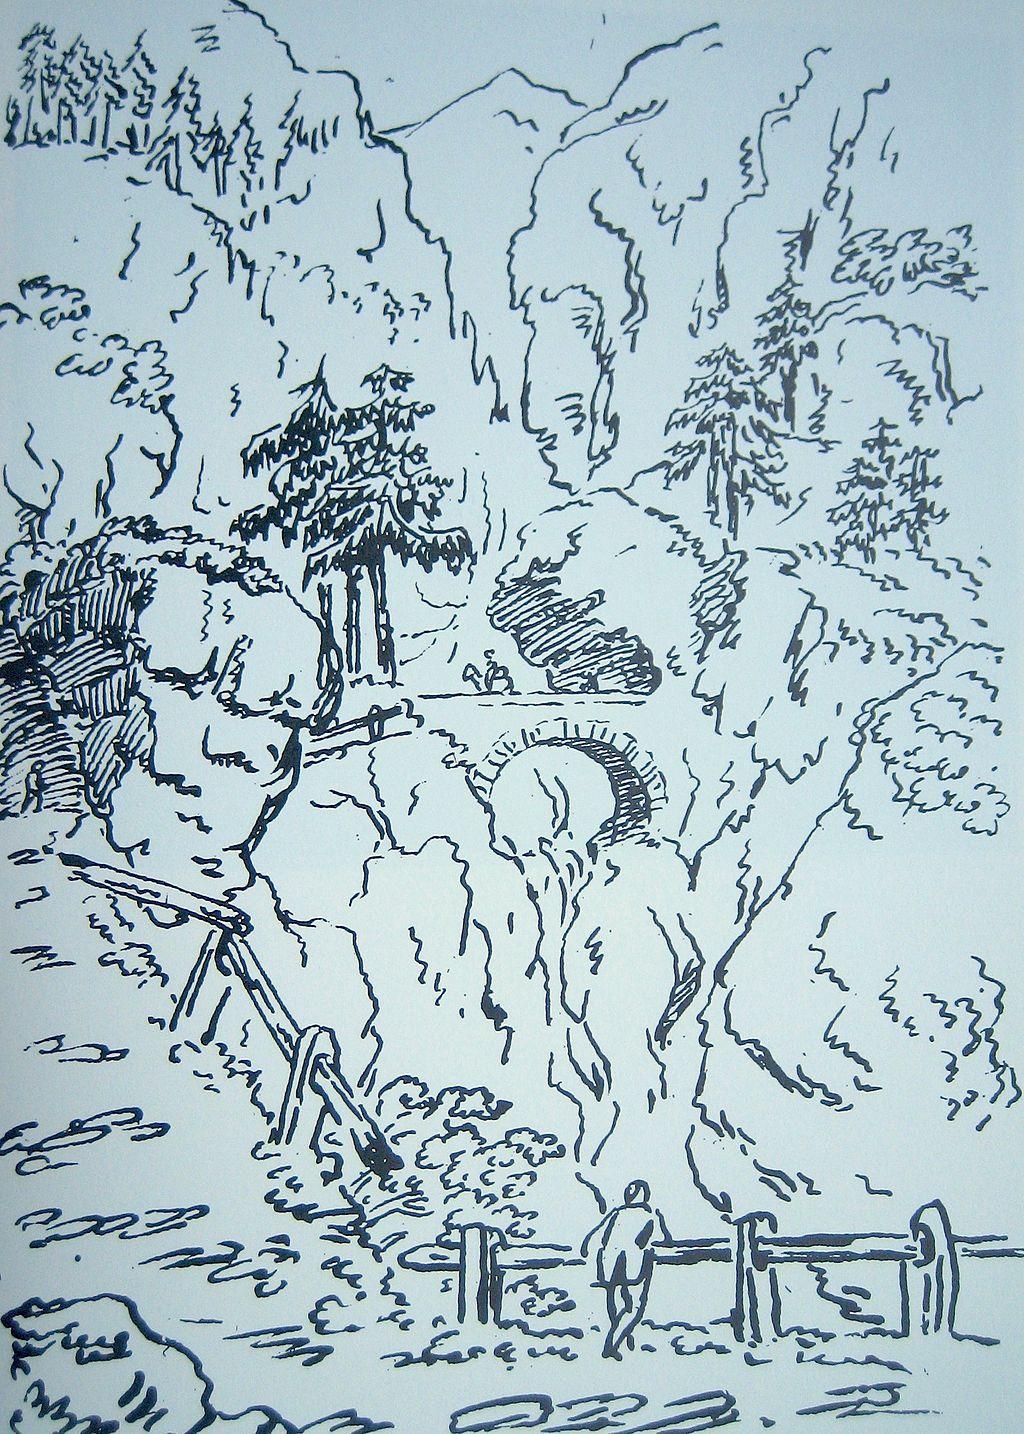 ViaMala_Zeichnung_JW_Goethe_1788